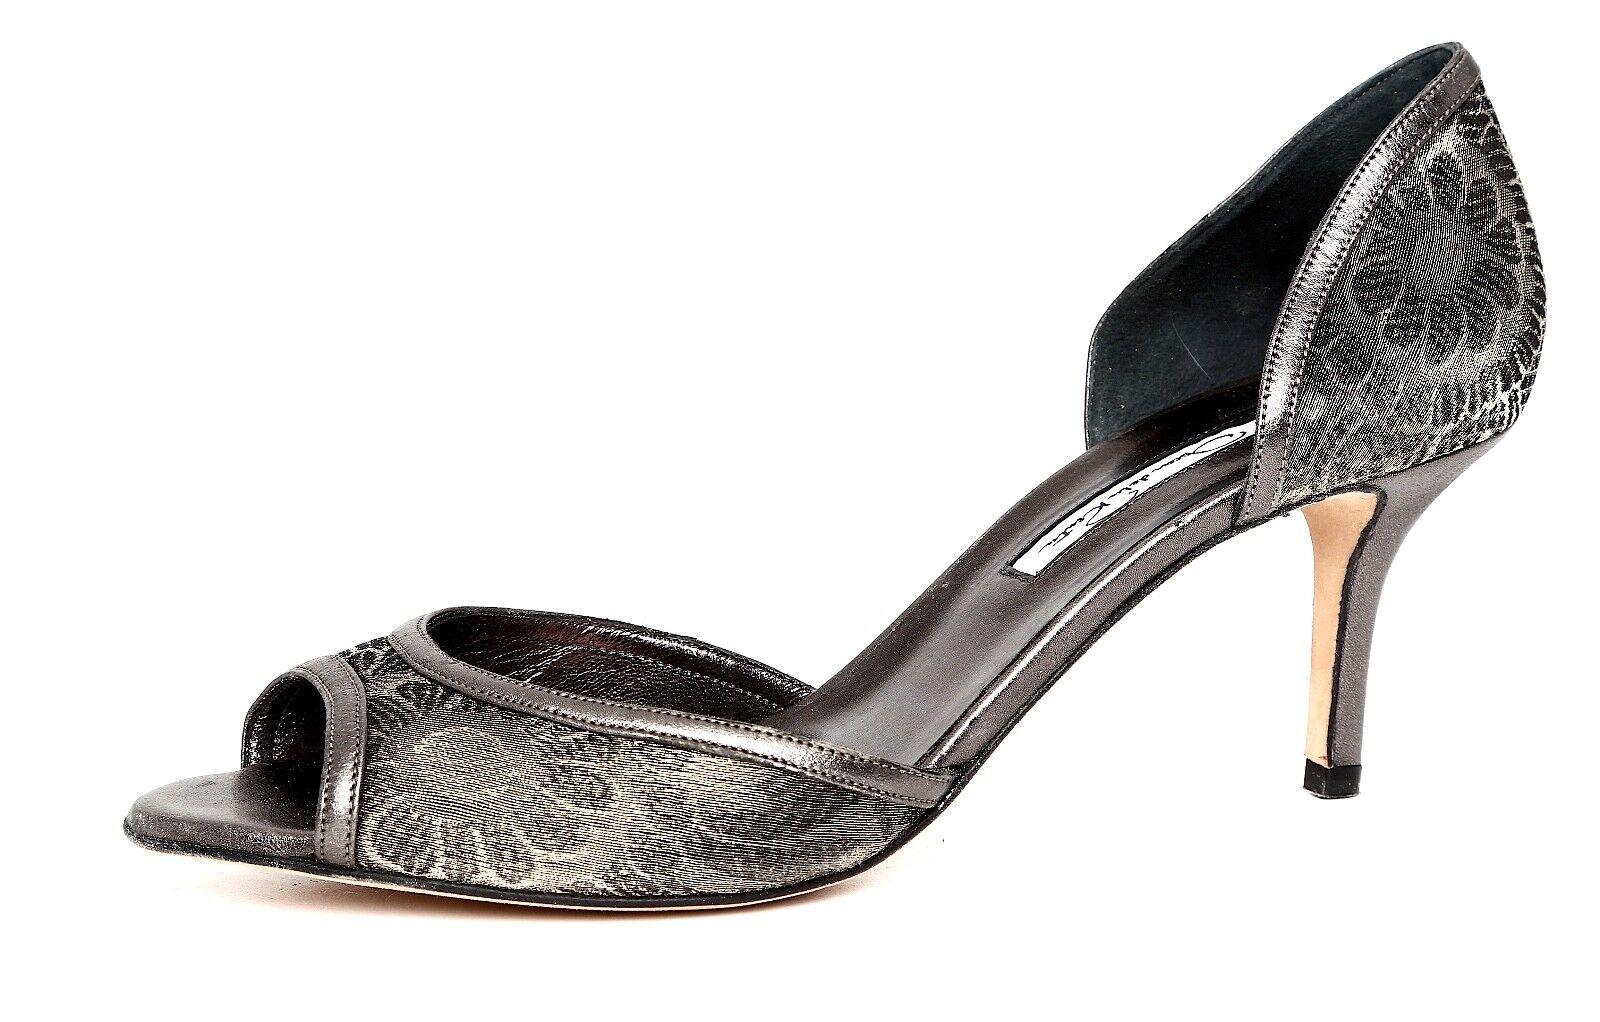 Oscar De La Renta Slip On Leather Pump Metallic femmes Sz 39 1676